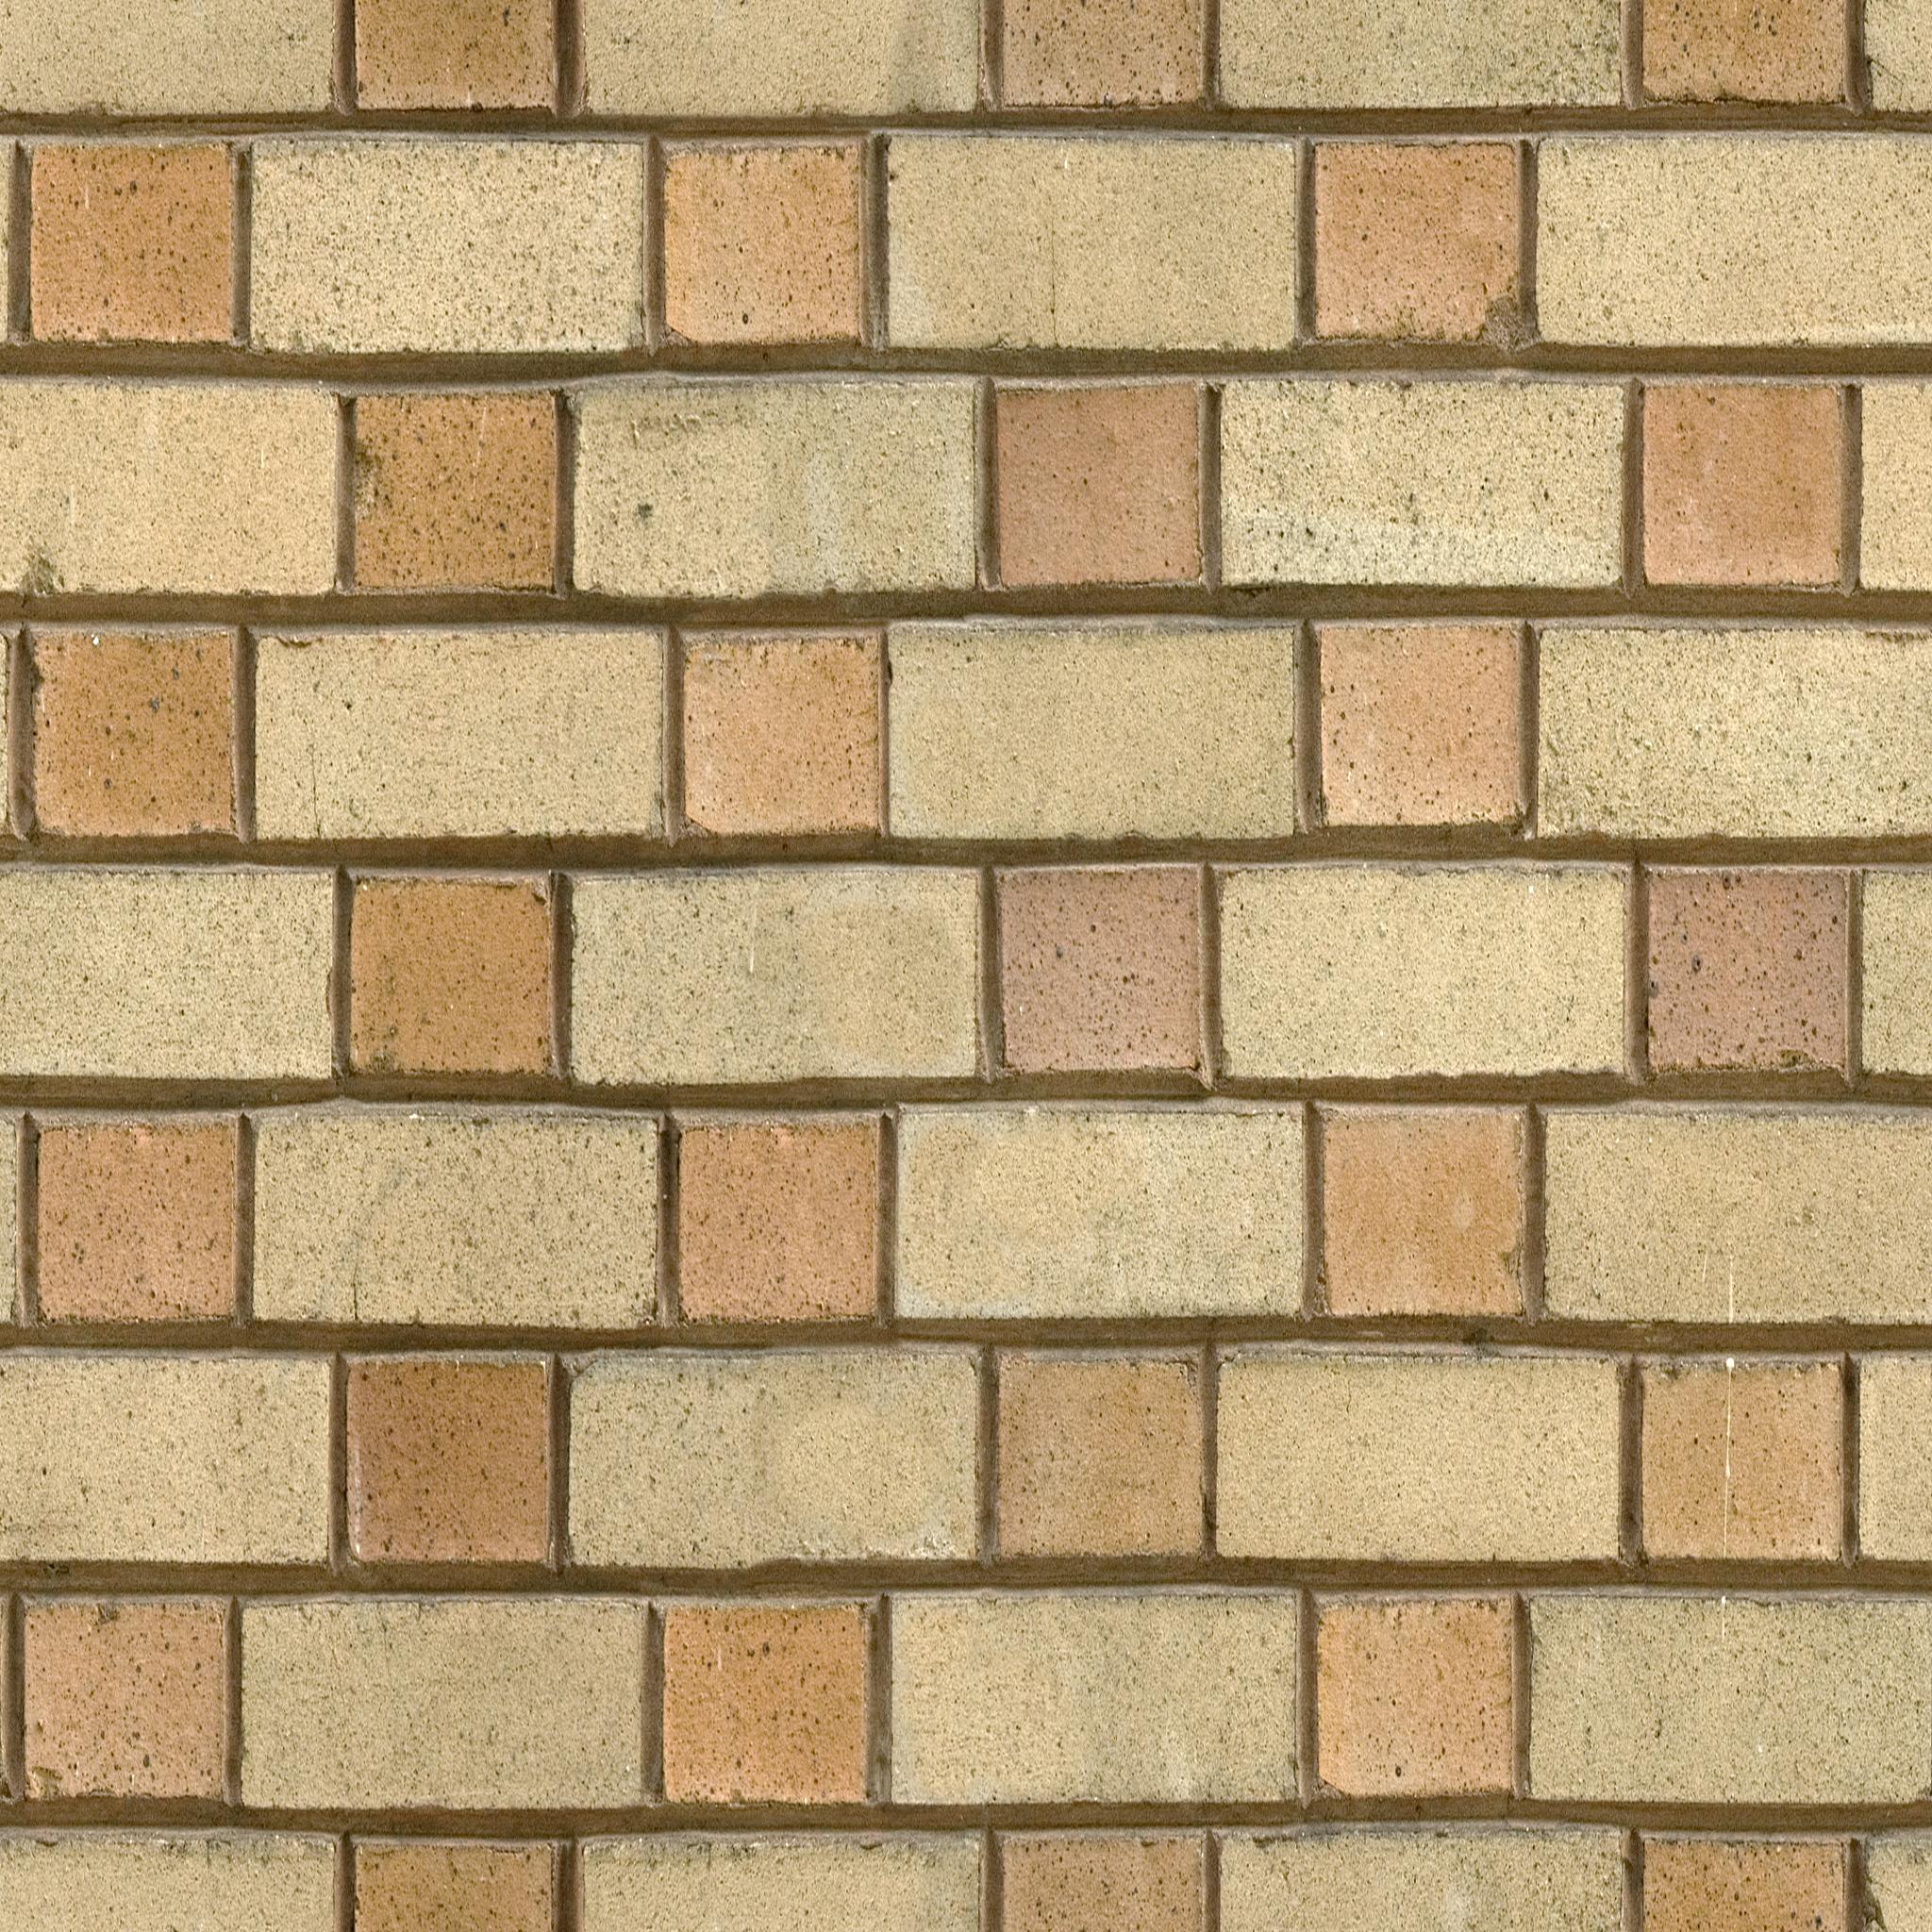 Oatmeal Brown Brick.jpg